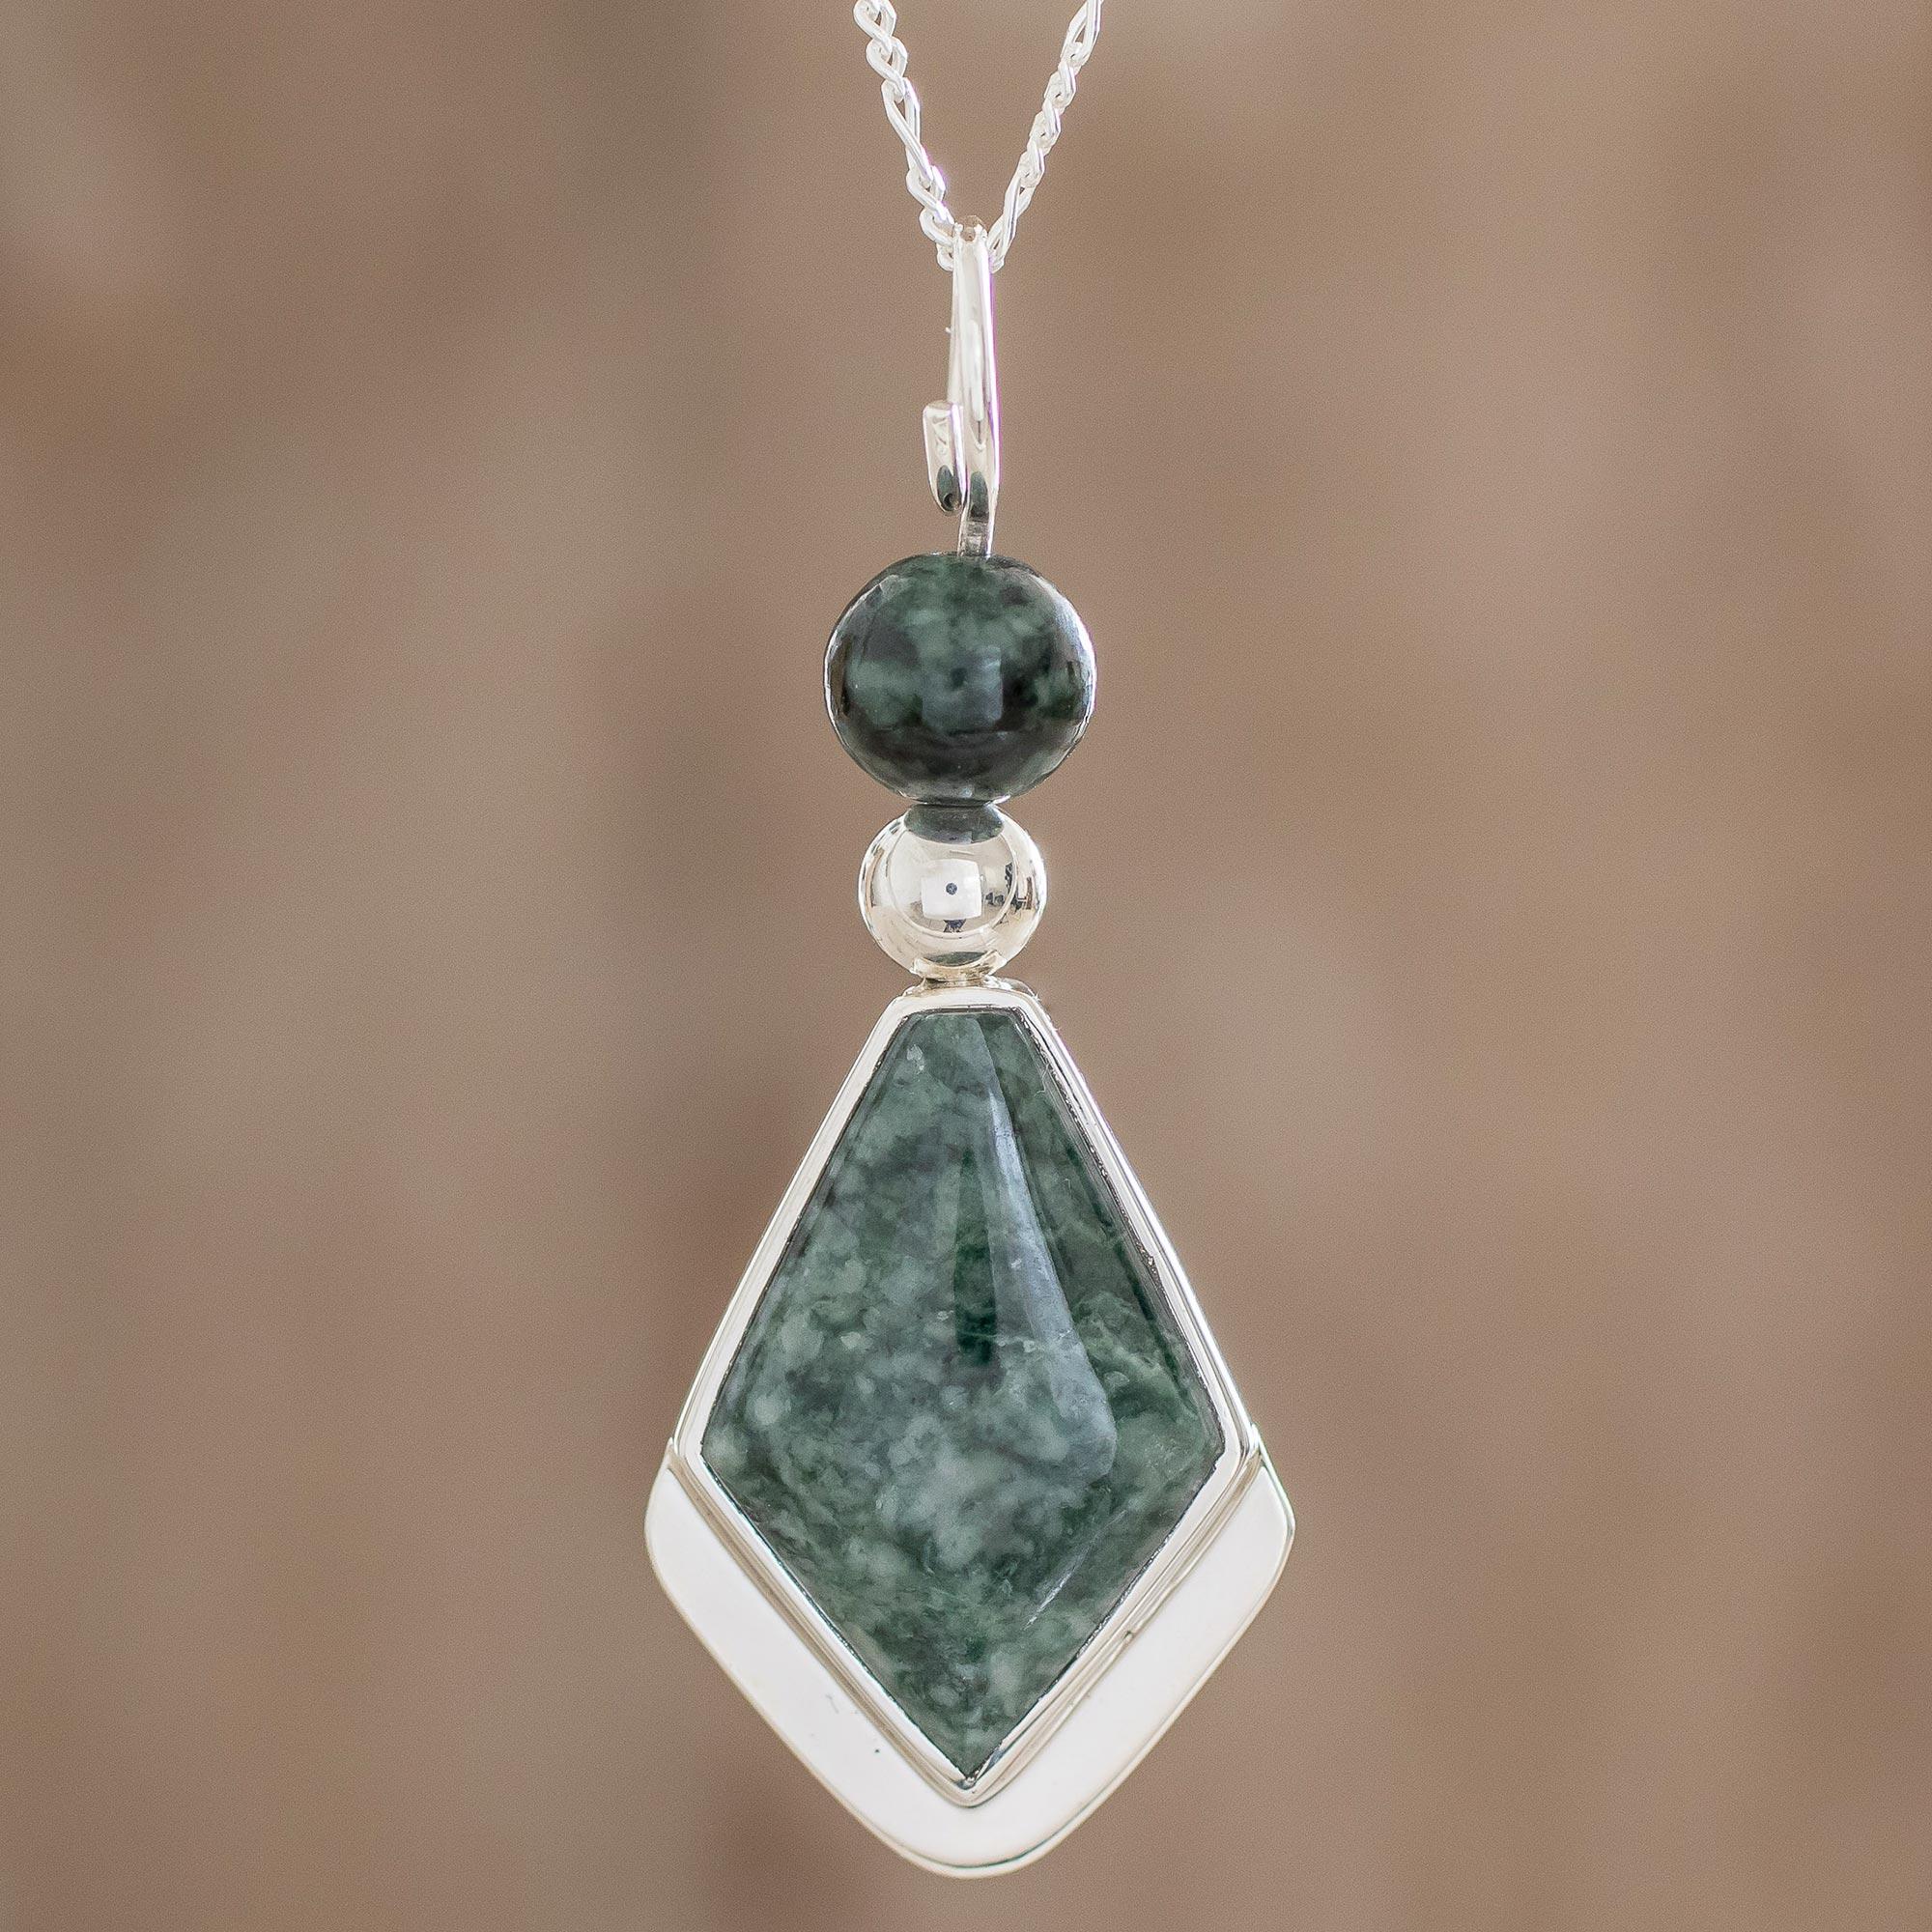 ea65a3704f Arrow-Shaped Green Jade Pendant Necklace from Guatemala - Green ...